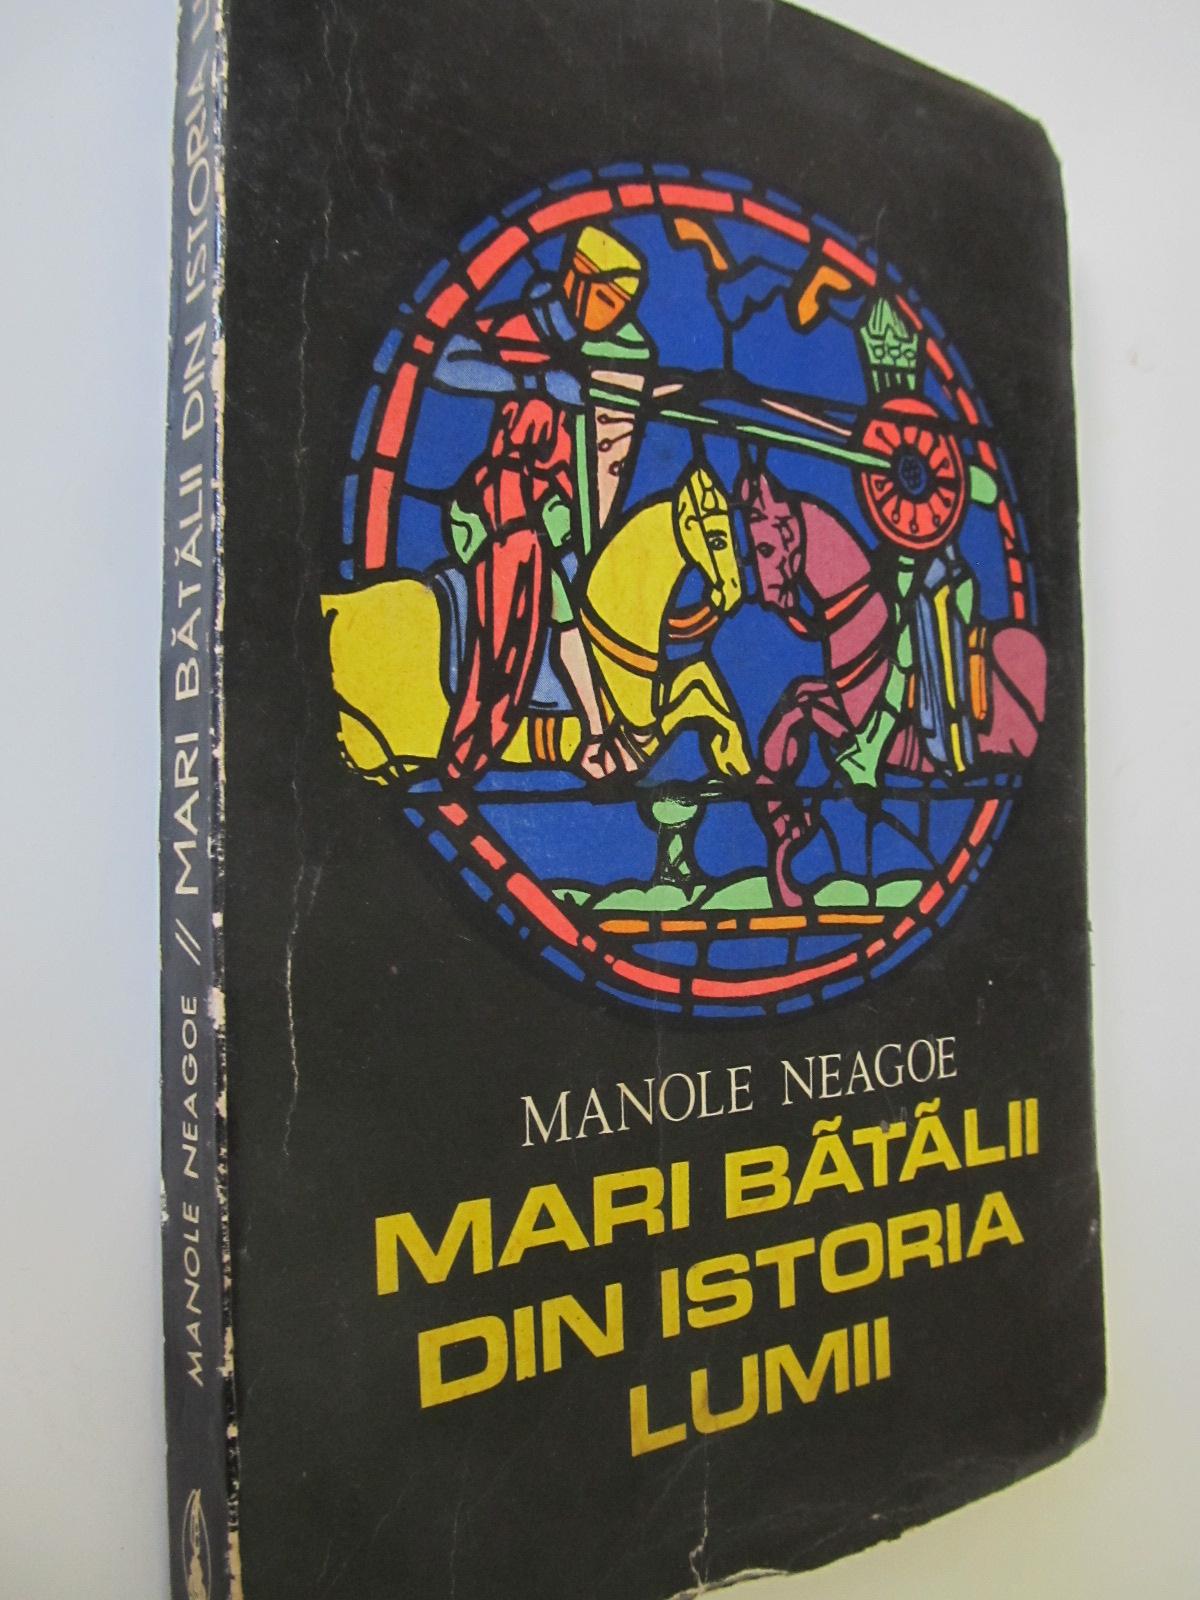 Mari batalii din istoria lumii (vol. 1) - Manole Neagoe | Detalii carte